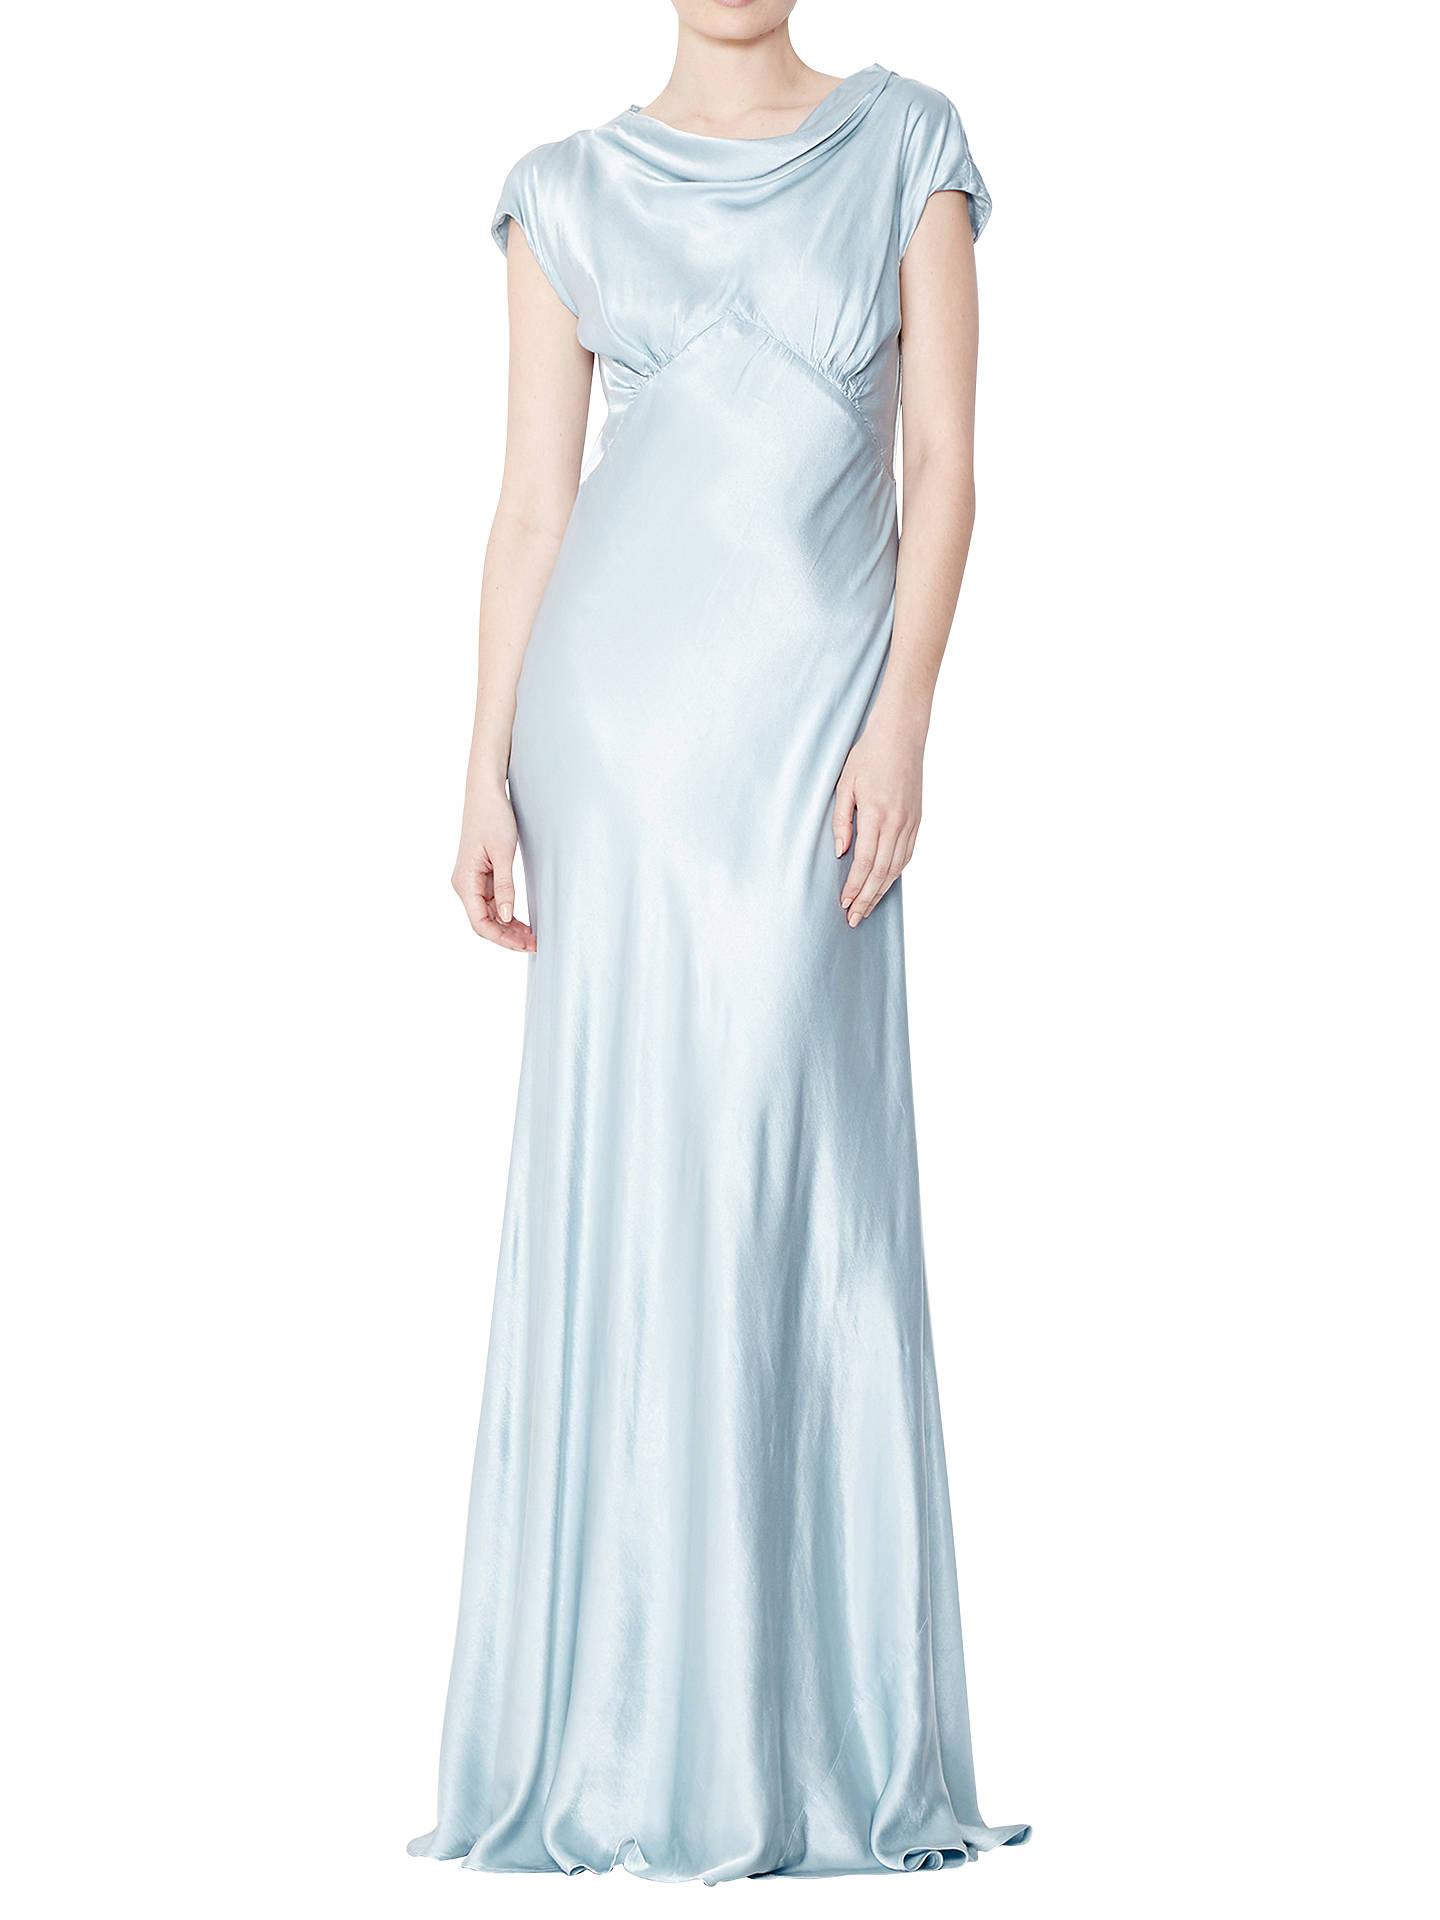 0aaba1d41252 Buy Ghost Lyra Dress, Skylight, XS Online at johnlewis.com ...